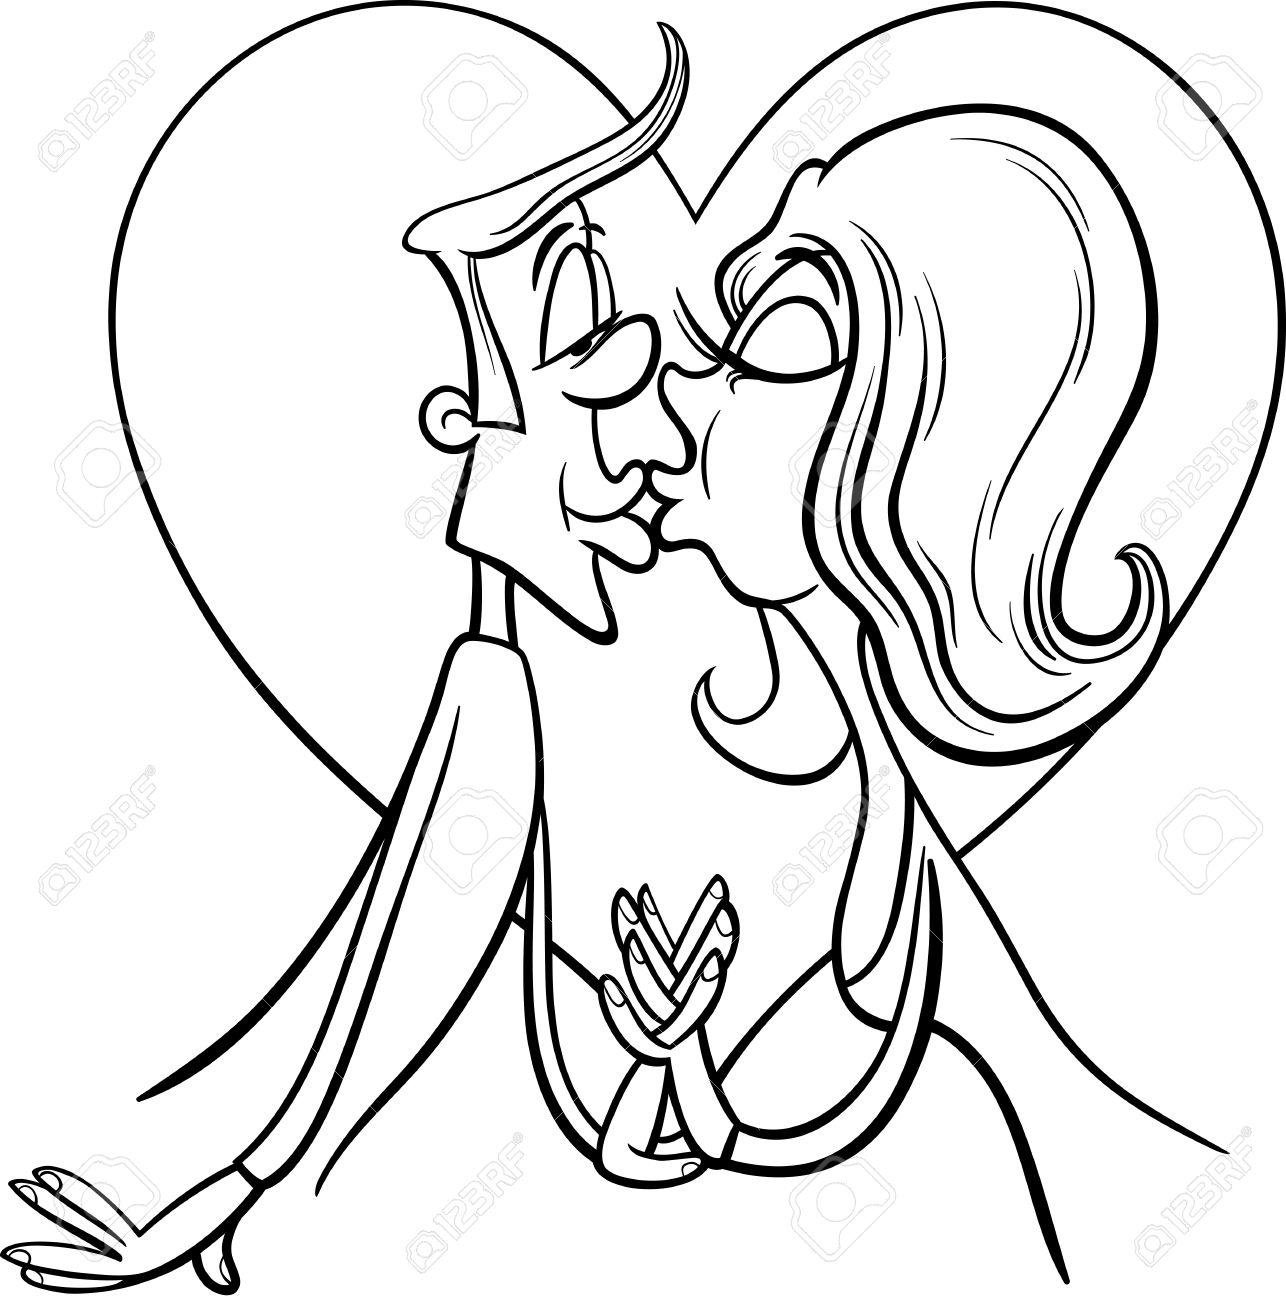 Blanco Y Negro Dia De San Valentin De Dibujos Animados Ilustracion